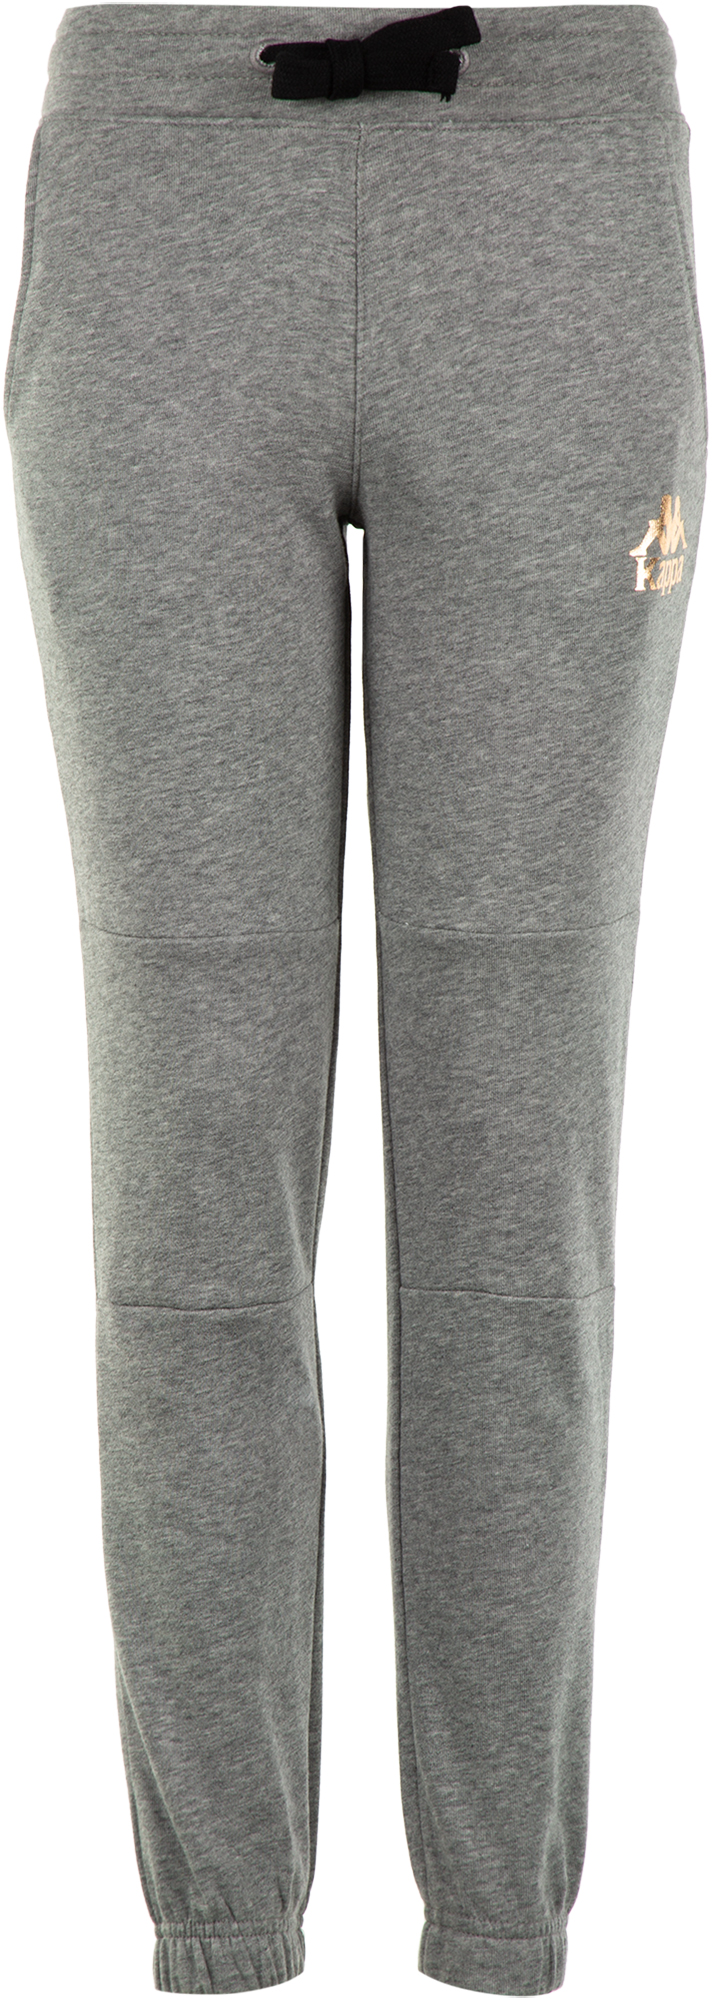 Kappa Брюки для девочек Kappa, размер 170 kappa брюки для девочек kappa размер 134